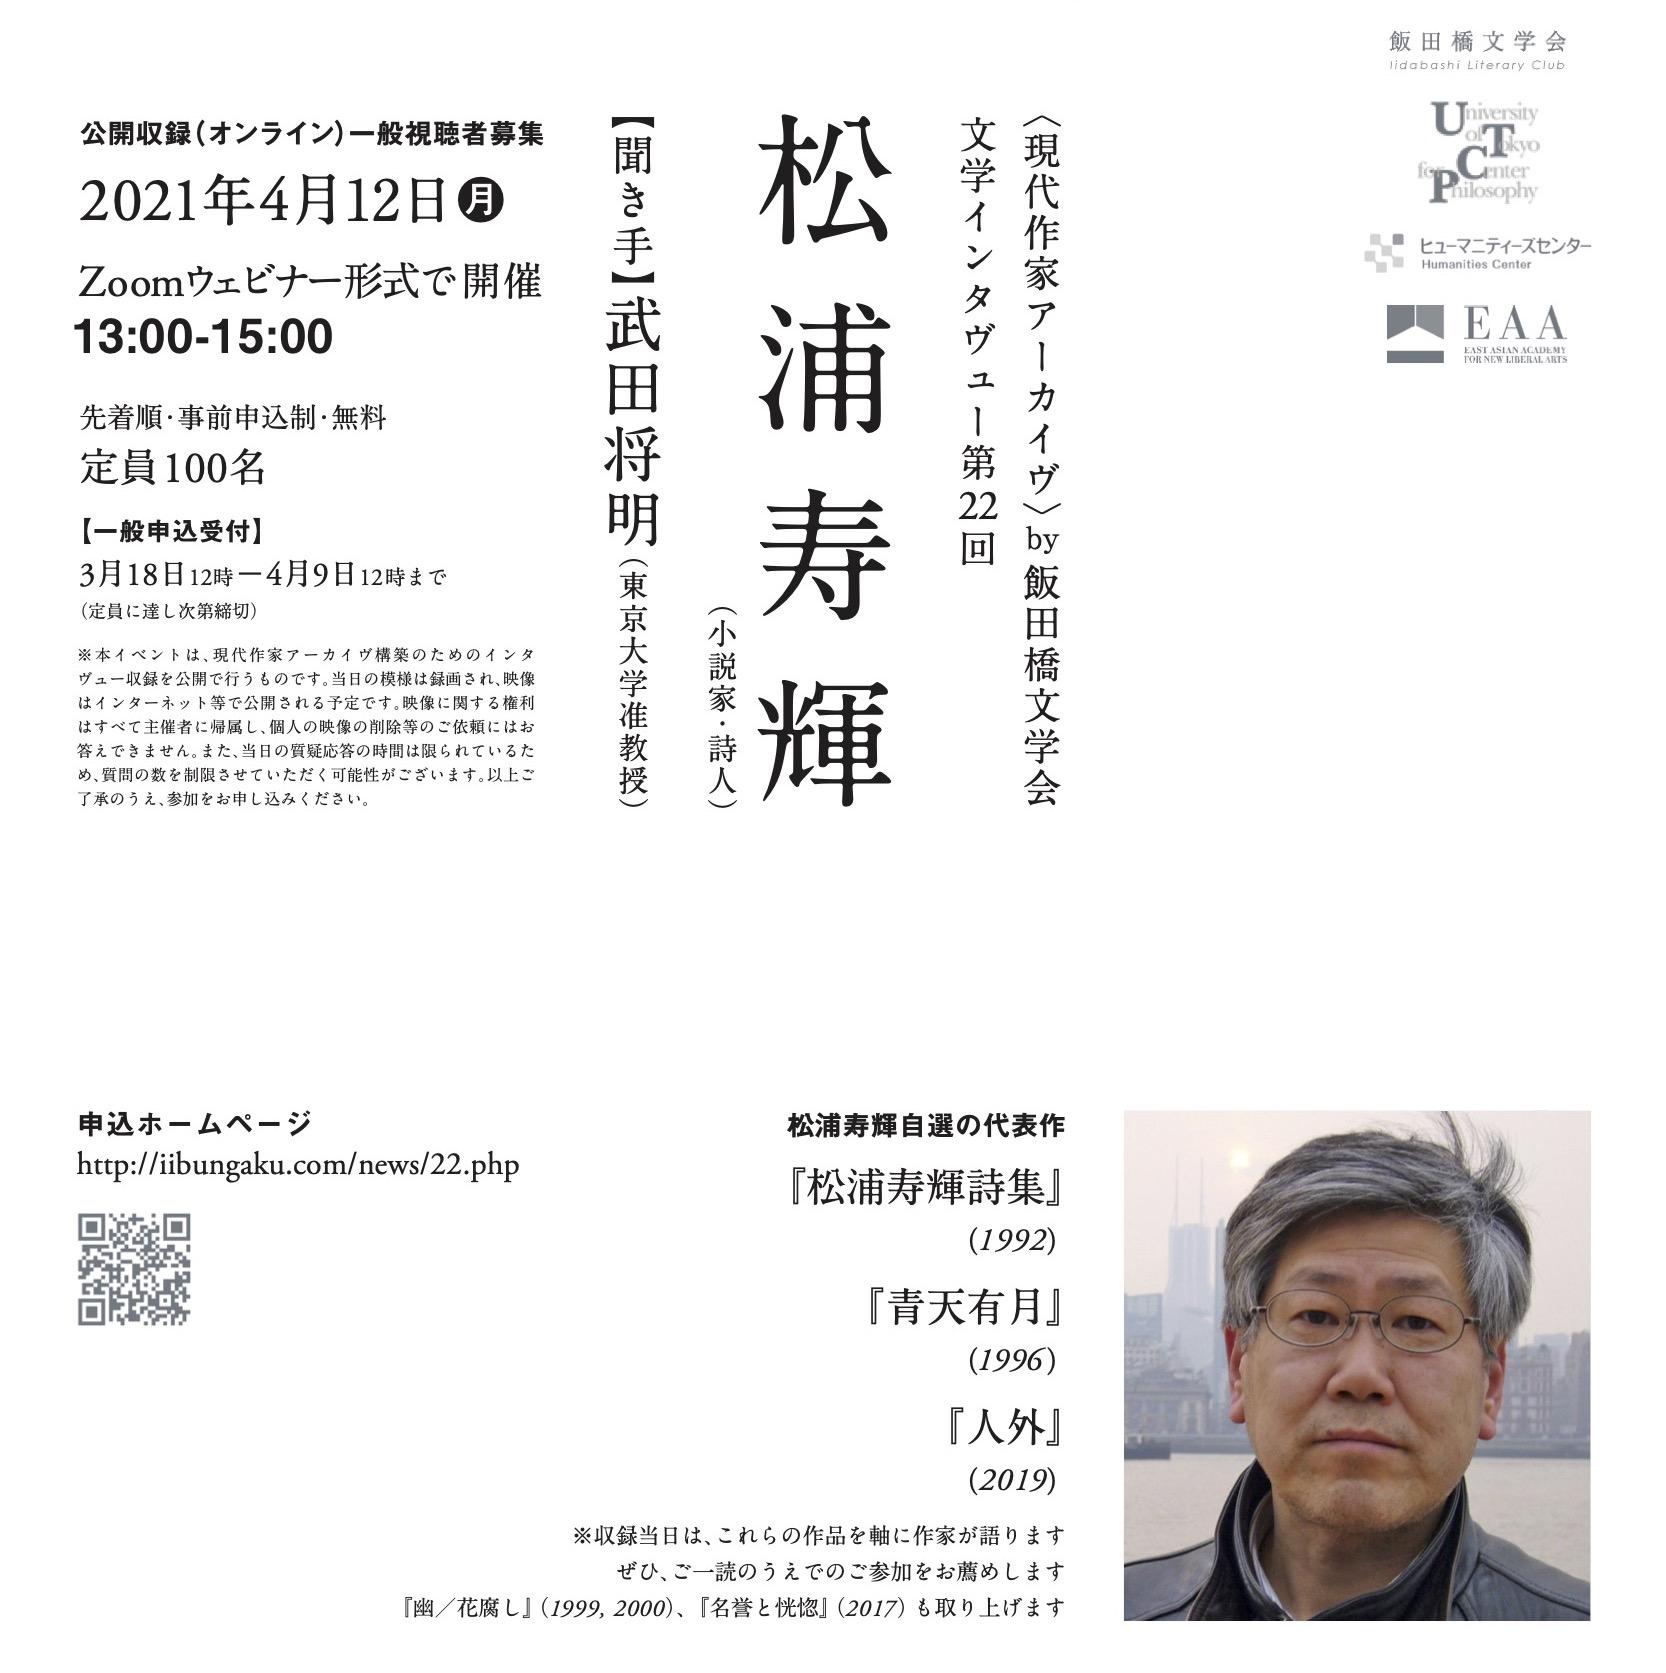 http://iibungaku.com/Matsuura_Hisaki_20210316_cut.jpg